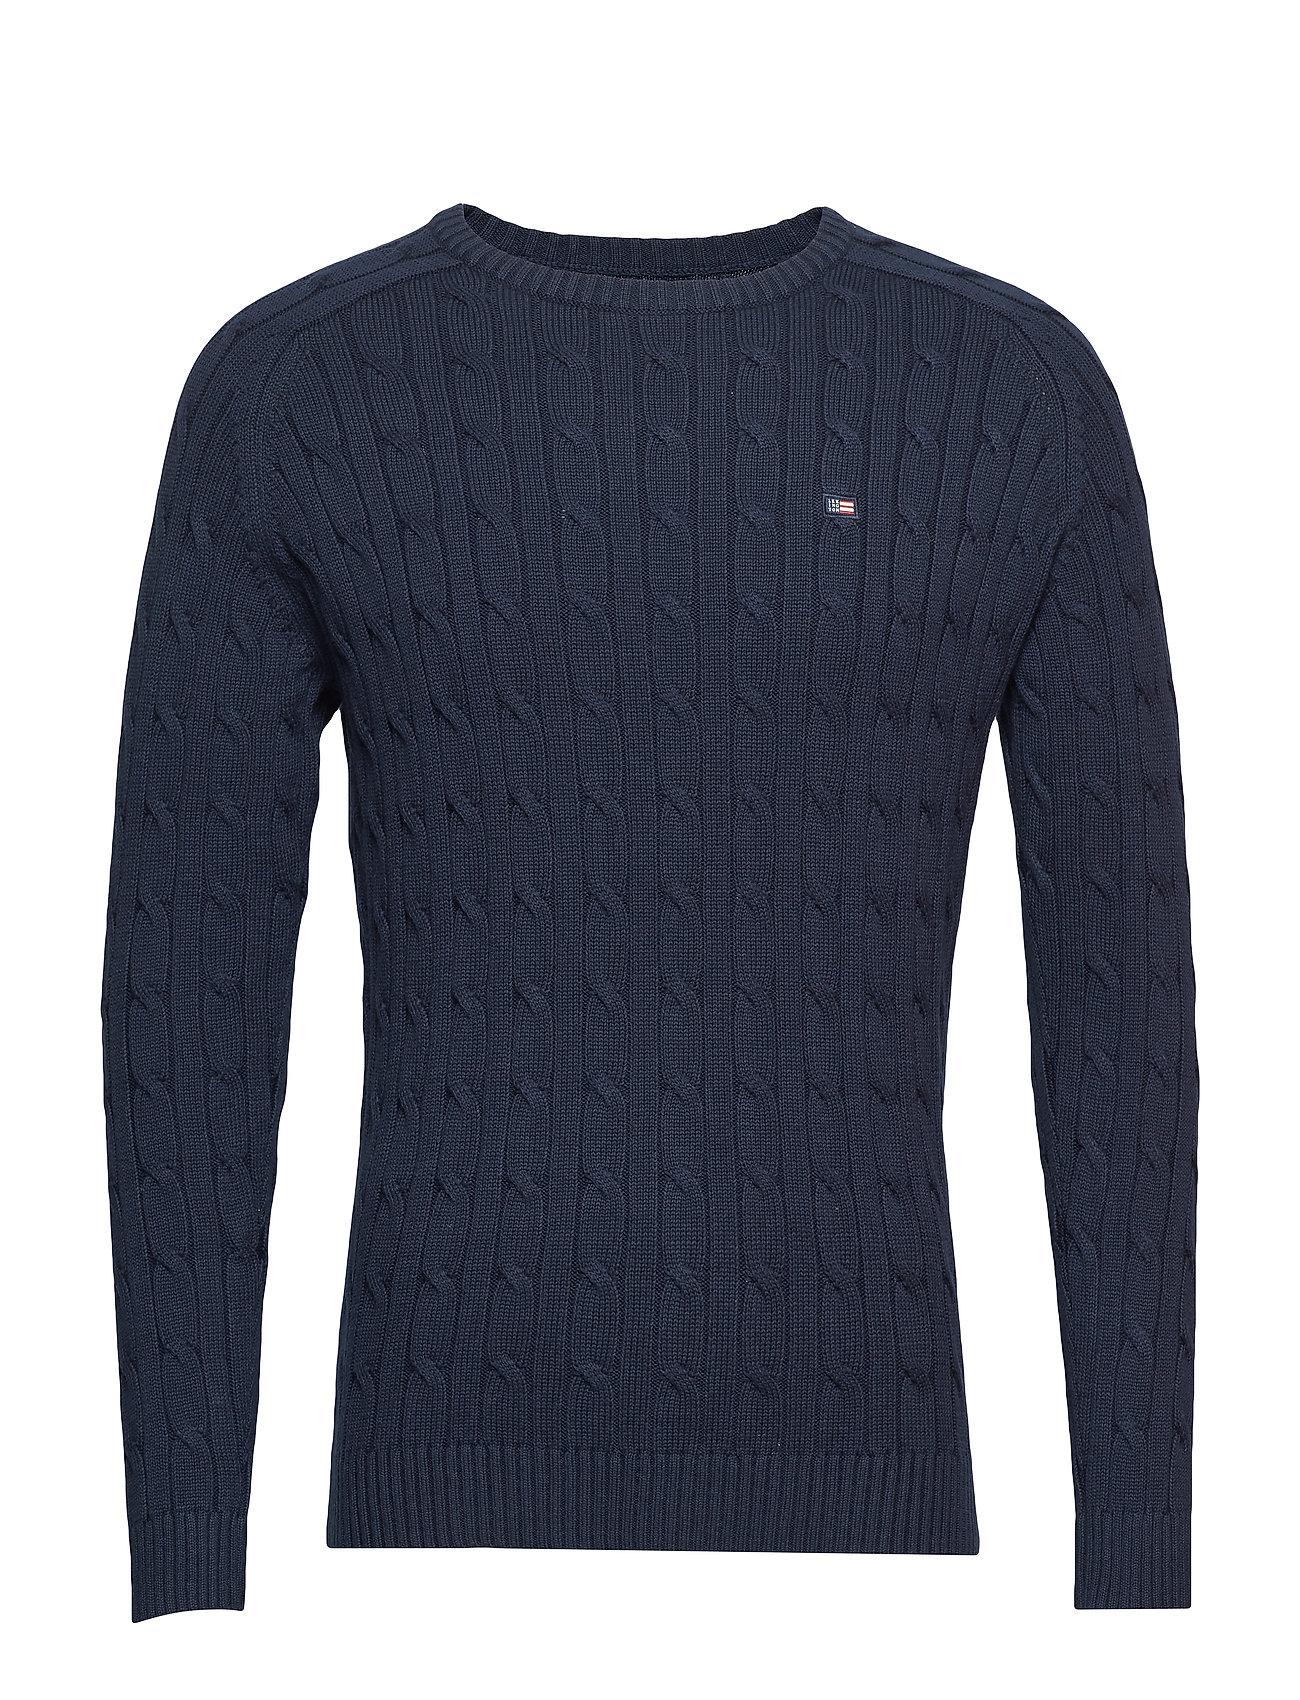 Sweaternavy Clothing Andrew Cable Cotton BlueLexington uPkZXi